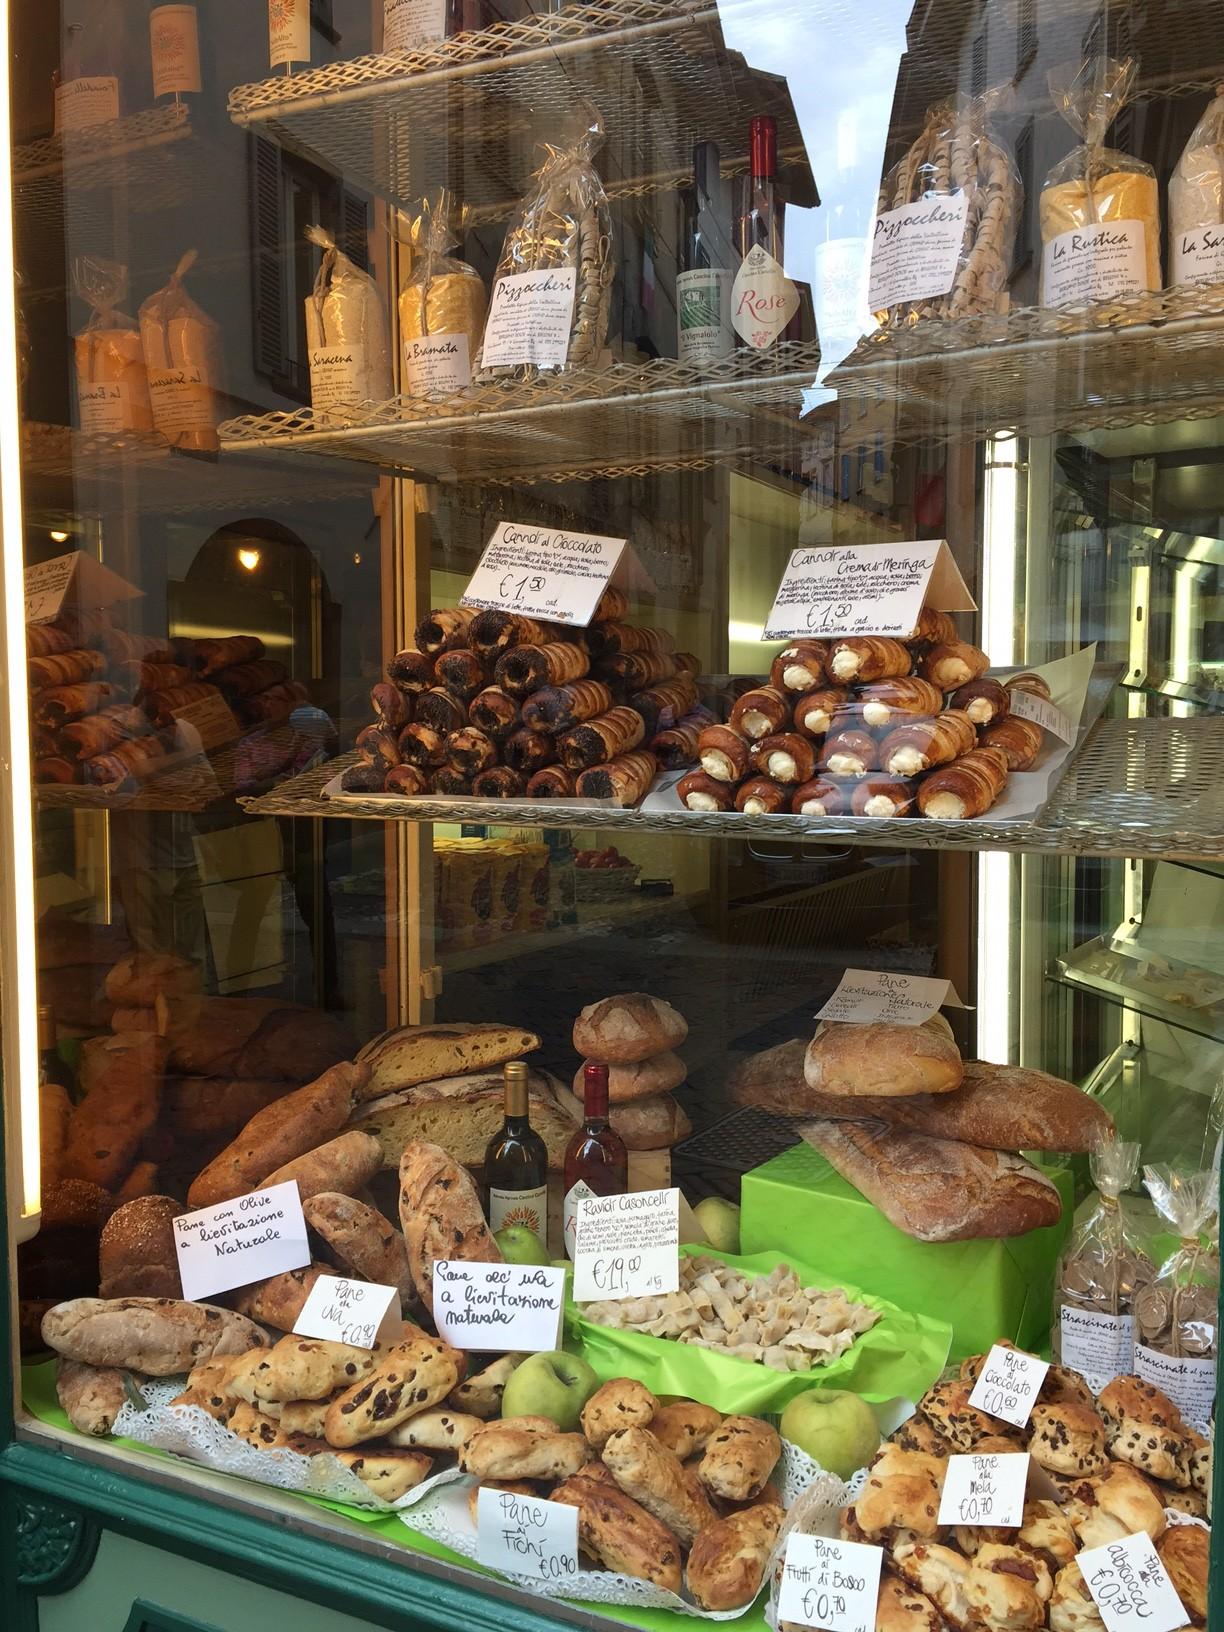 Bergamo Cannolis in a Store Window